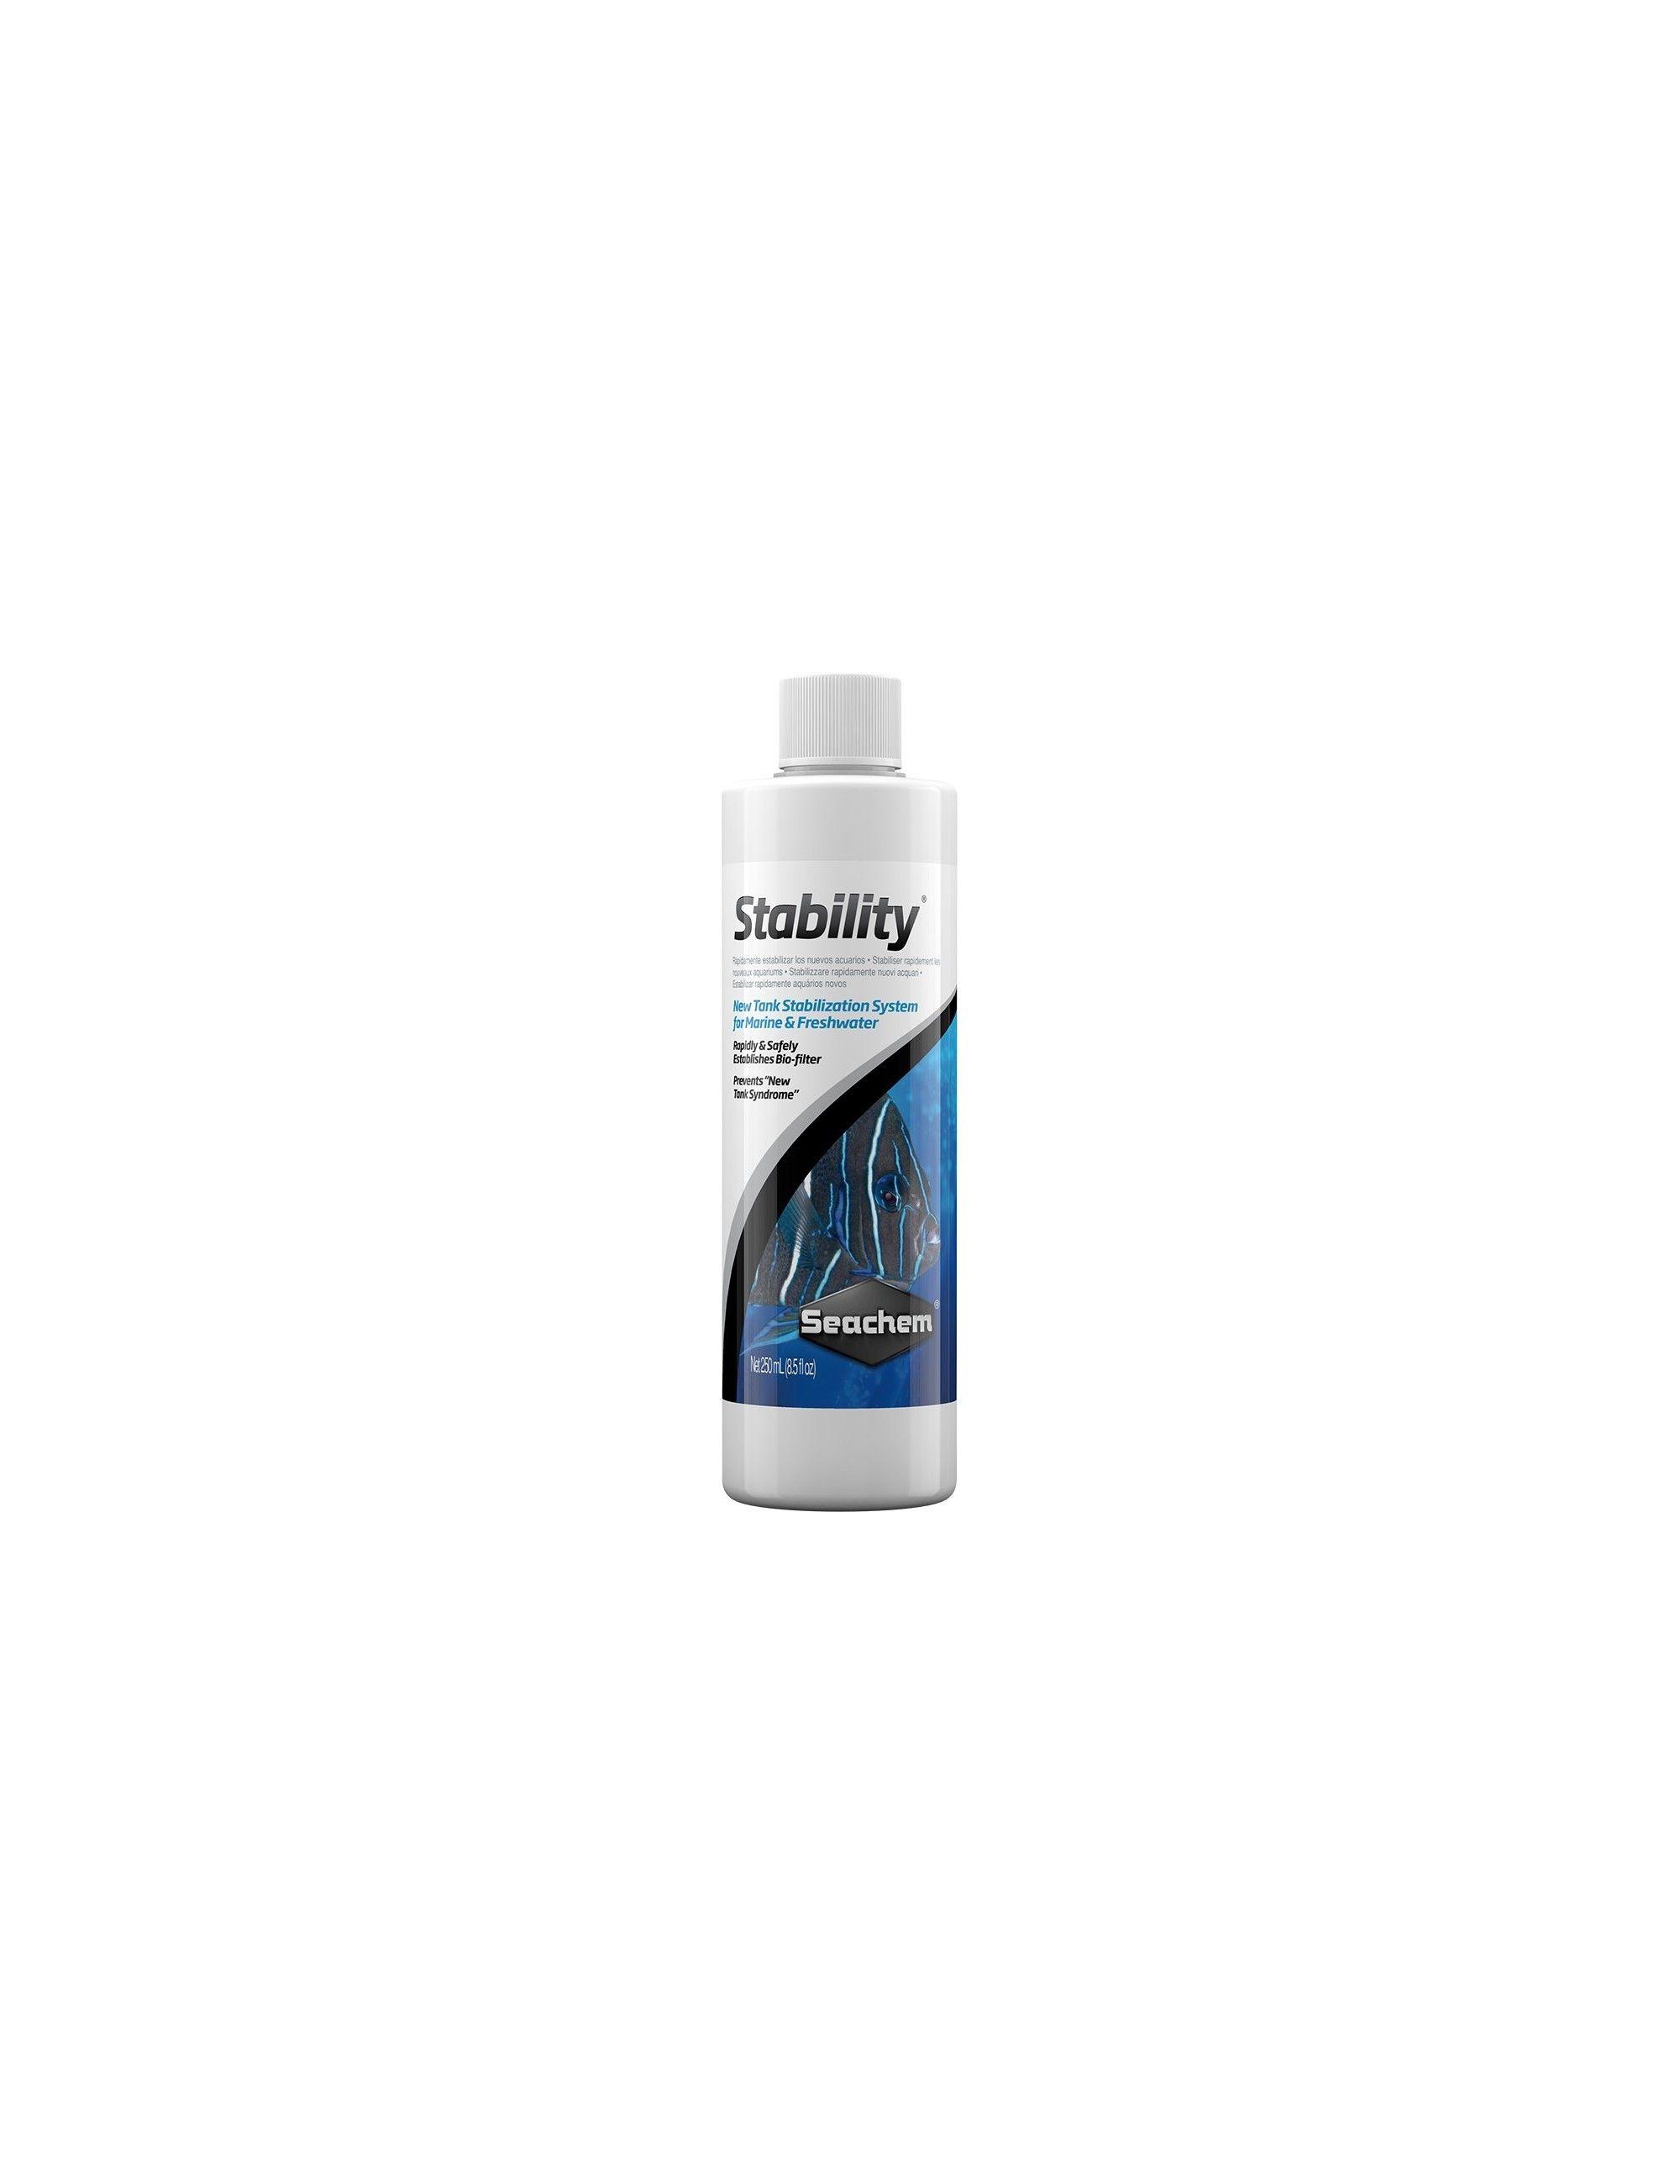 SEACHEM - Stability 100ml